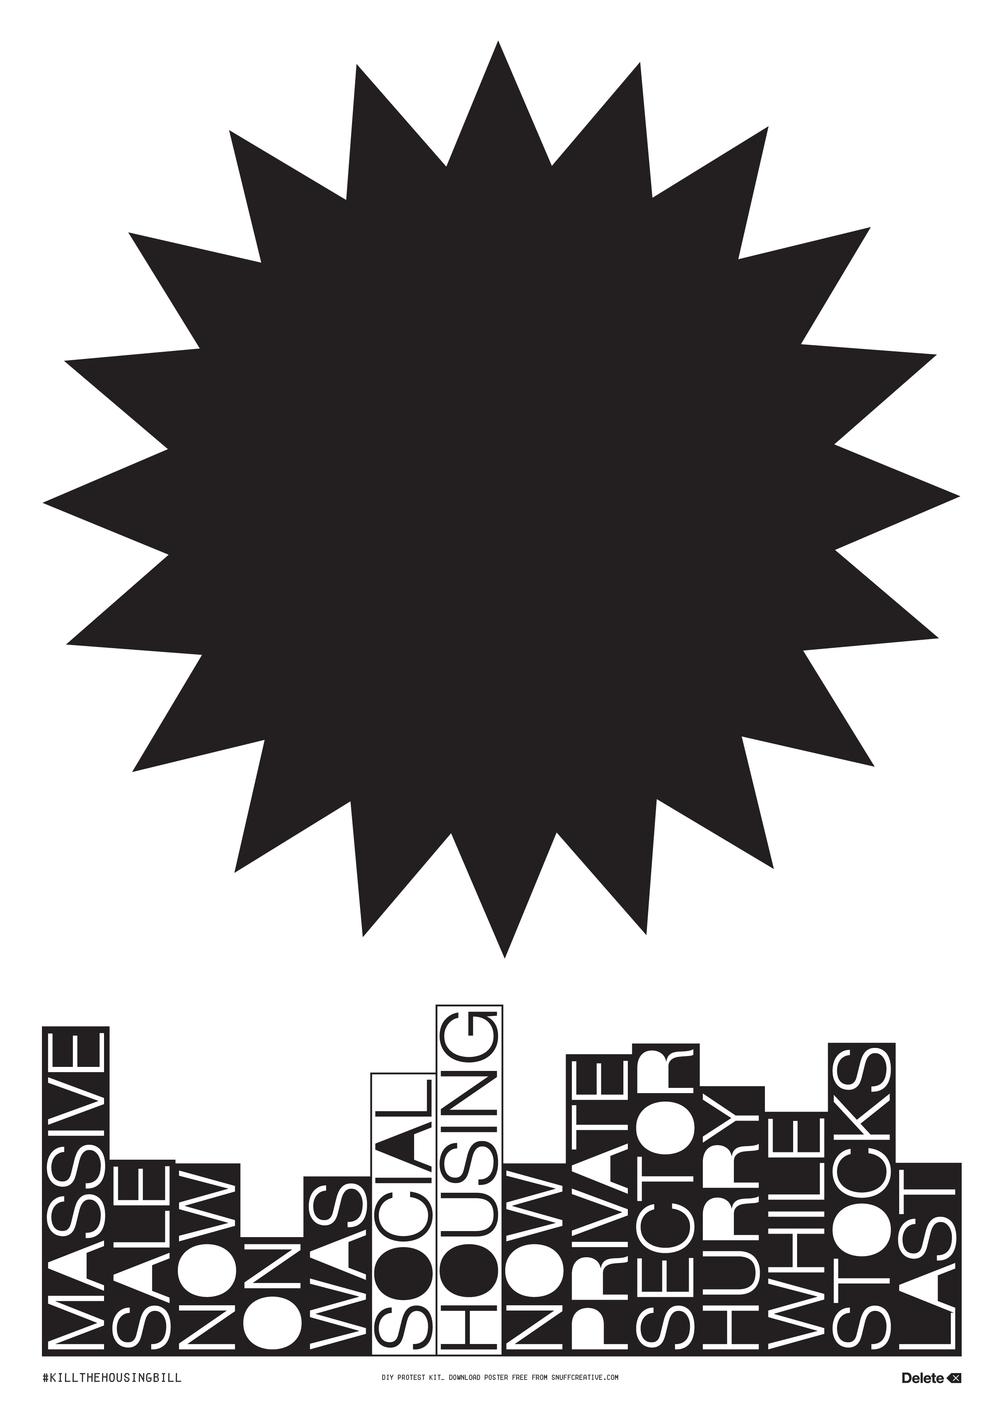 MASSIVE SALE TYPE POSTER_BLACK-04.jpg